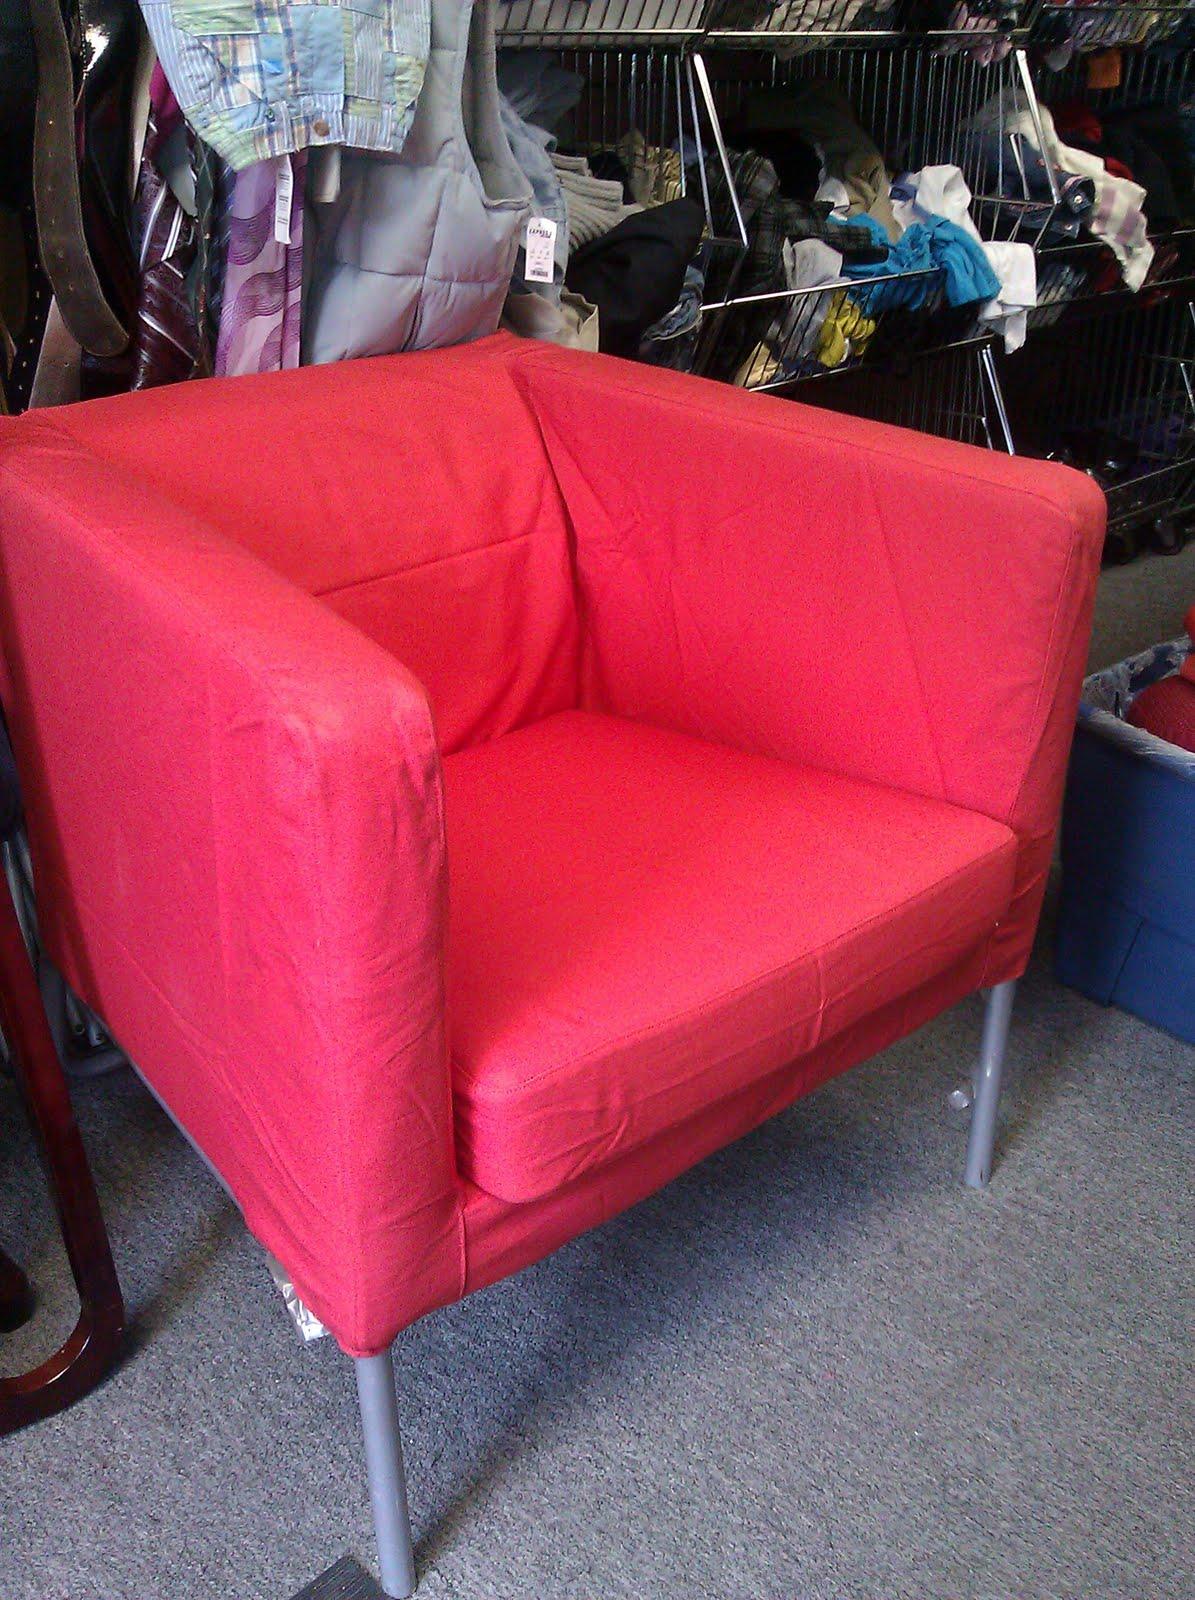 Admirable Gmasthriftshop Sold Ikea Chair Klappsta Inzonedesignstudio Interior Chair Design Inzonedesignstudiocom